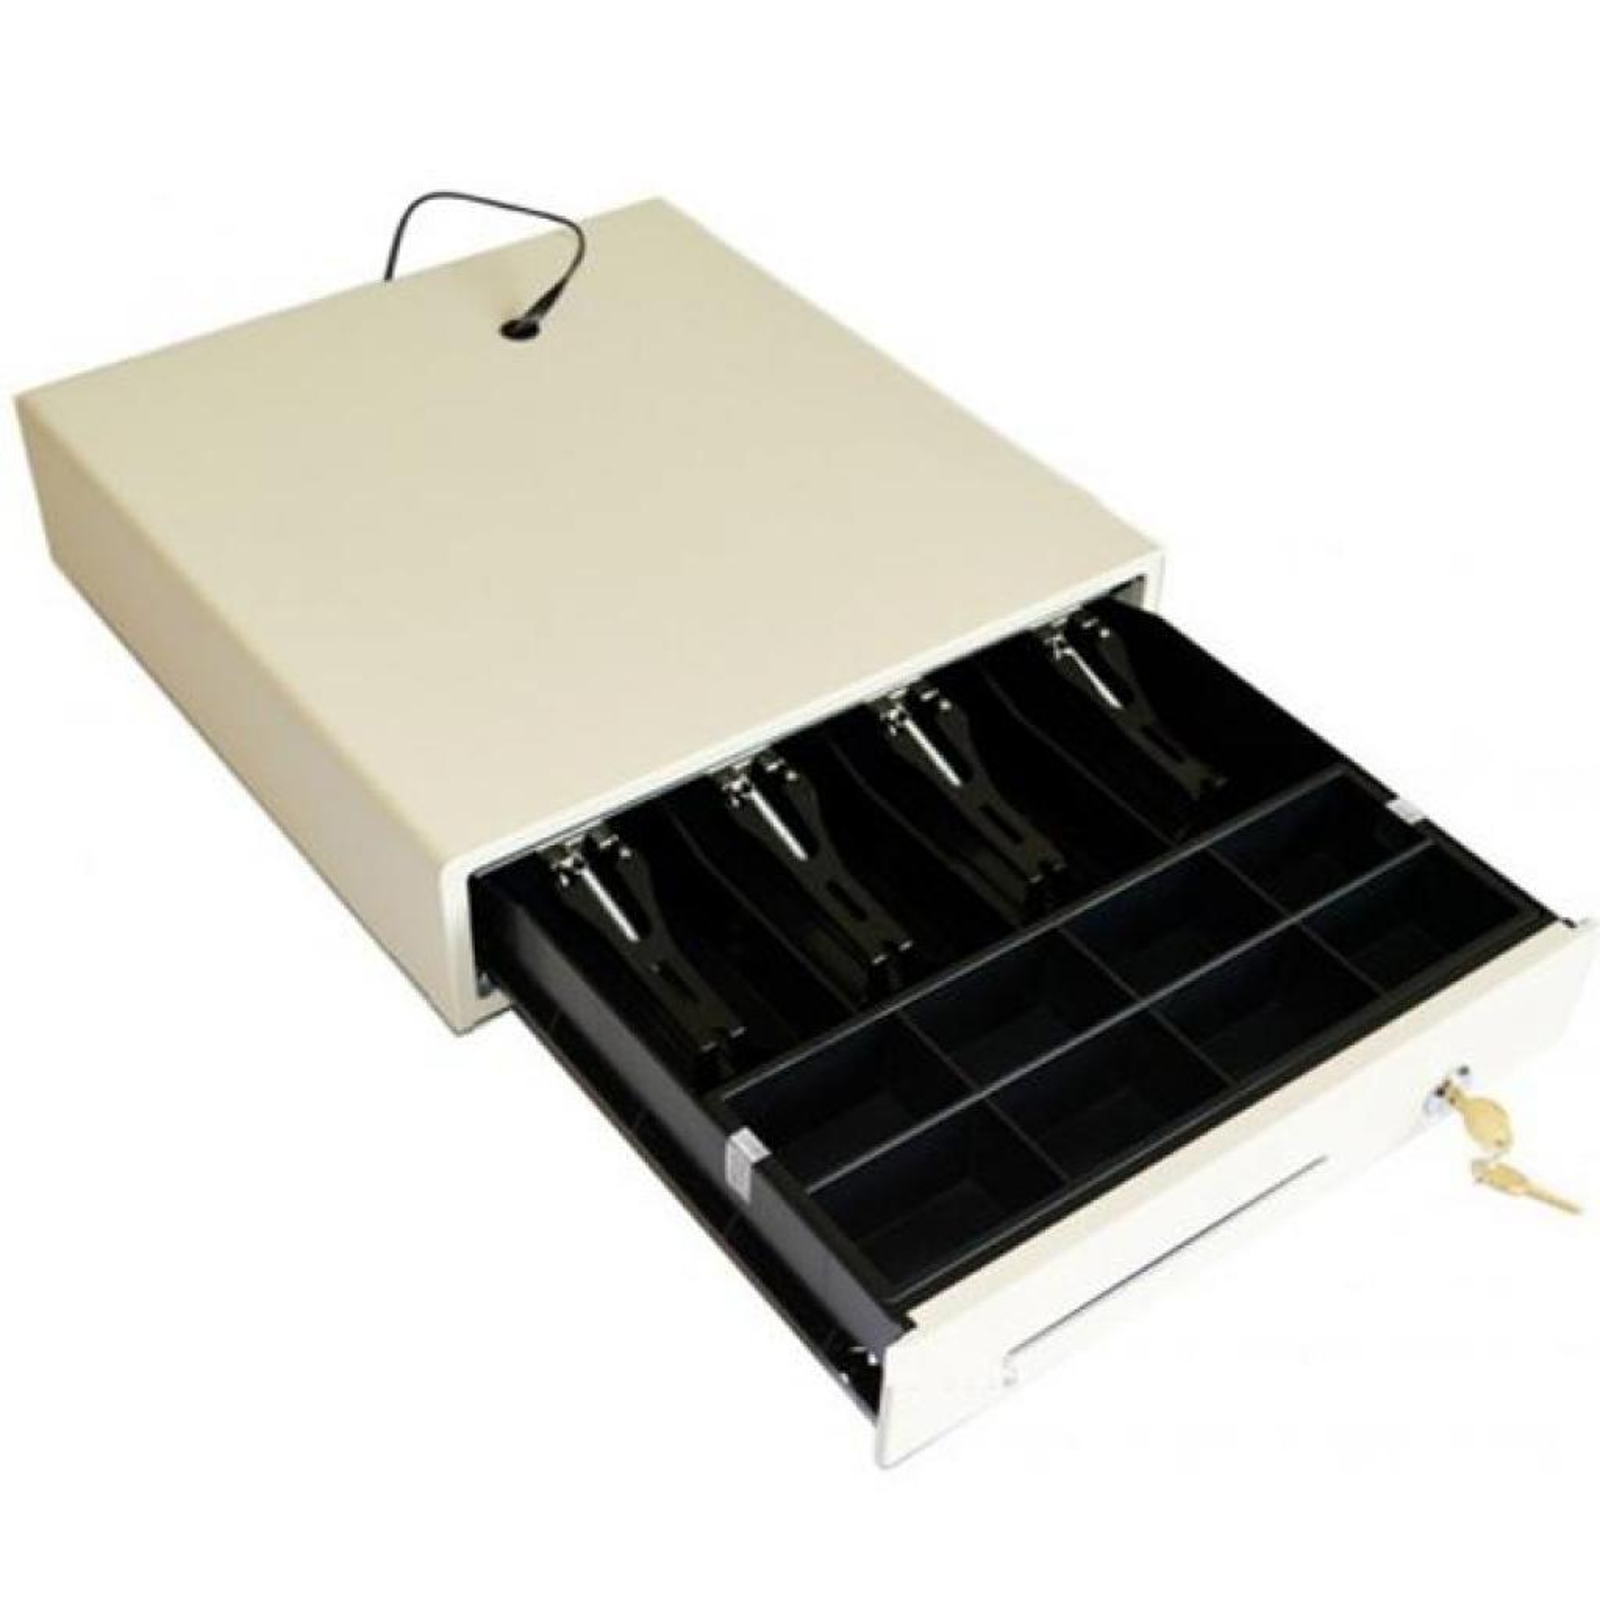 Денежный ящик ИКС-Маркет E3336D Ivory, 24V (E3336D IVORY 24V) изображение 2